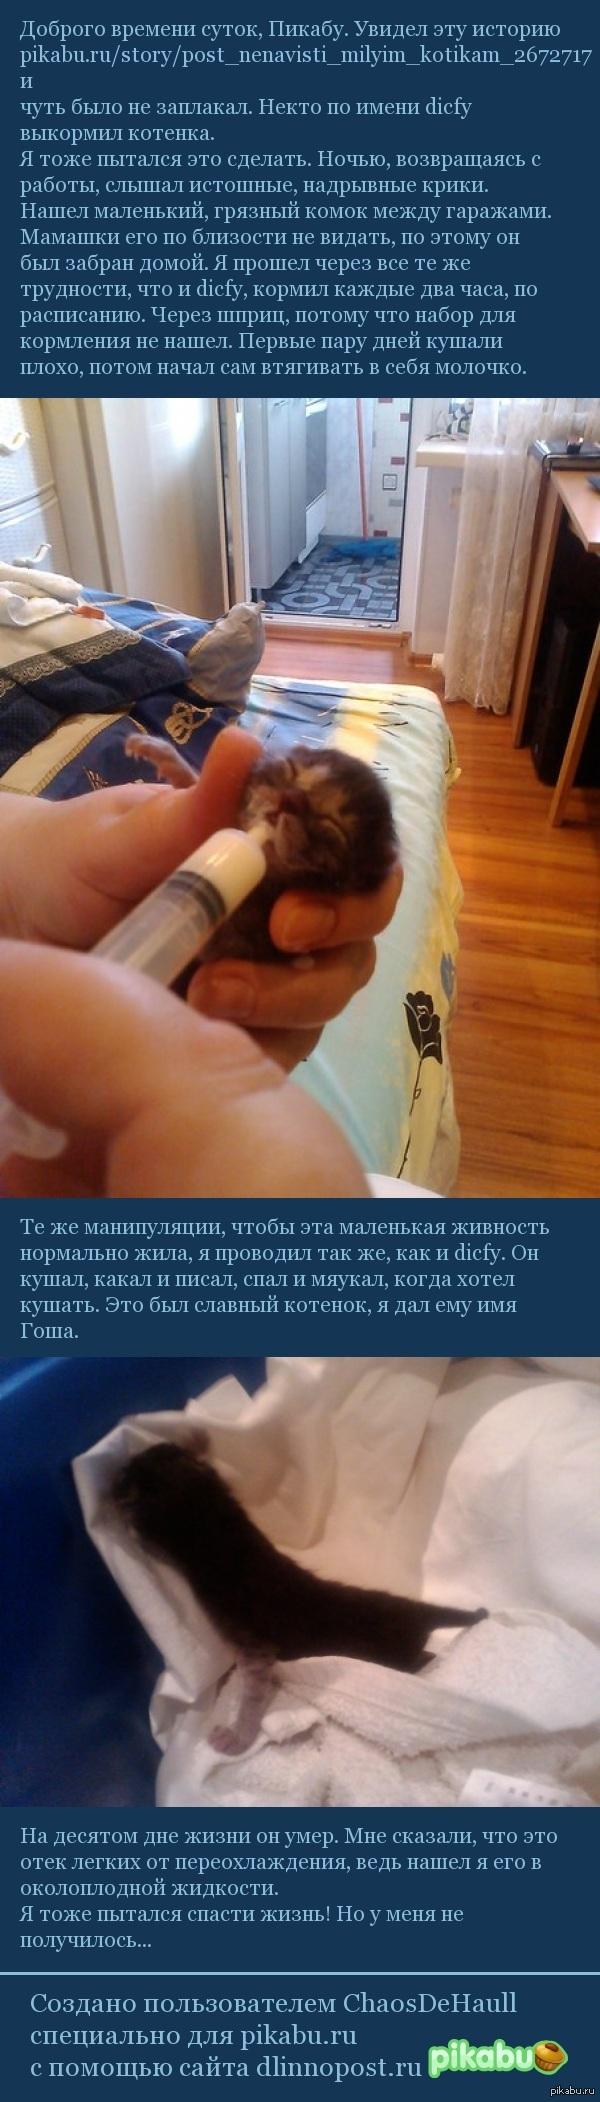 "Котенок <a href=""http://pikabu.ru/story/post_nenavisti_milyim_kotikam_2672717"">http://pikabu.ru/story/_2672717</a> история"